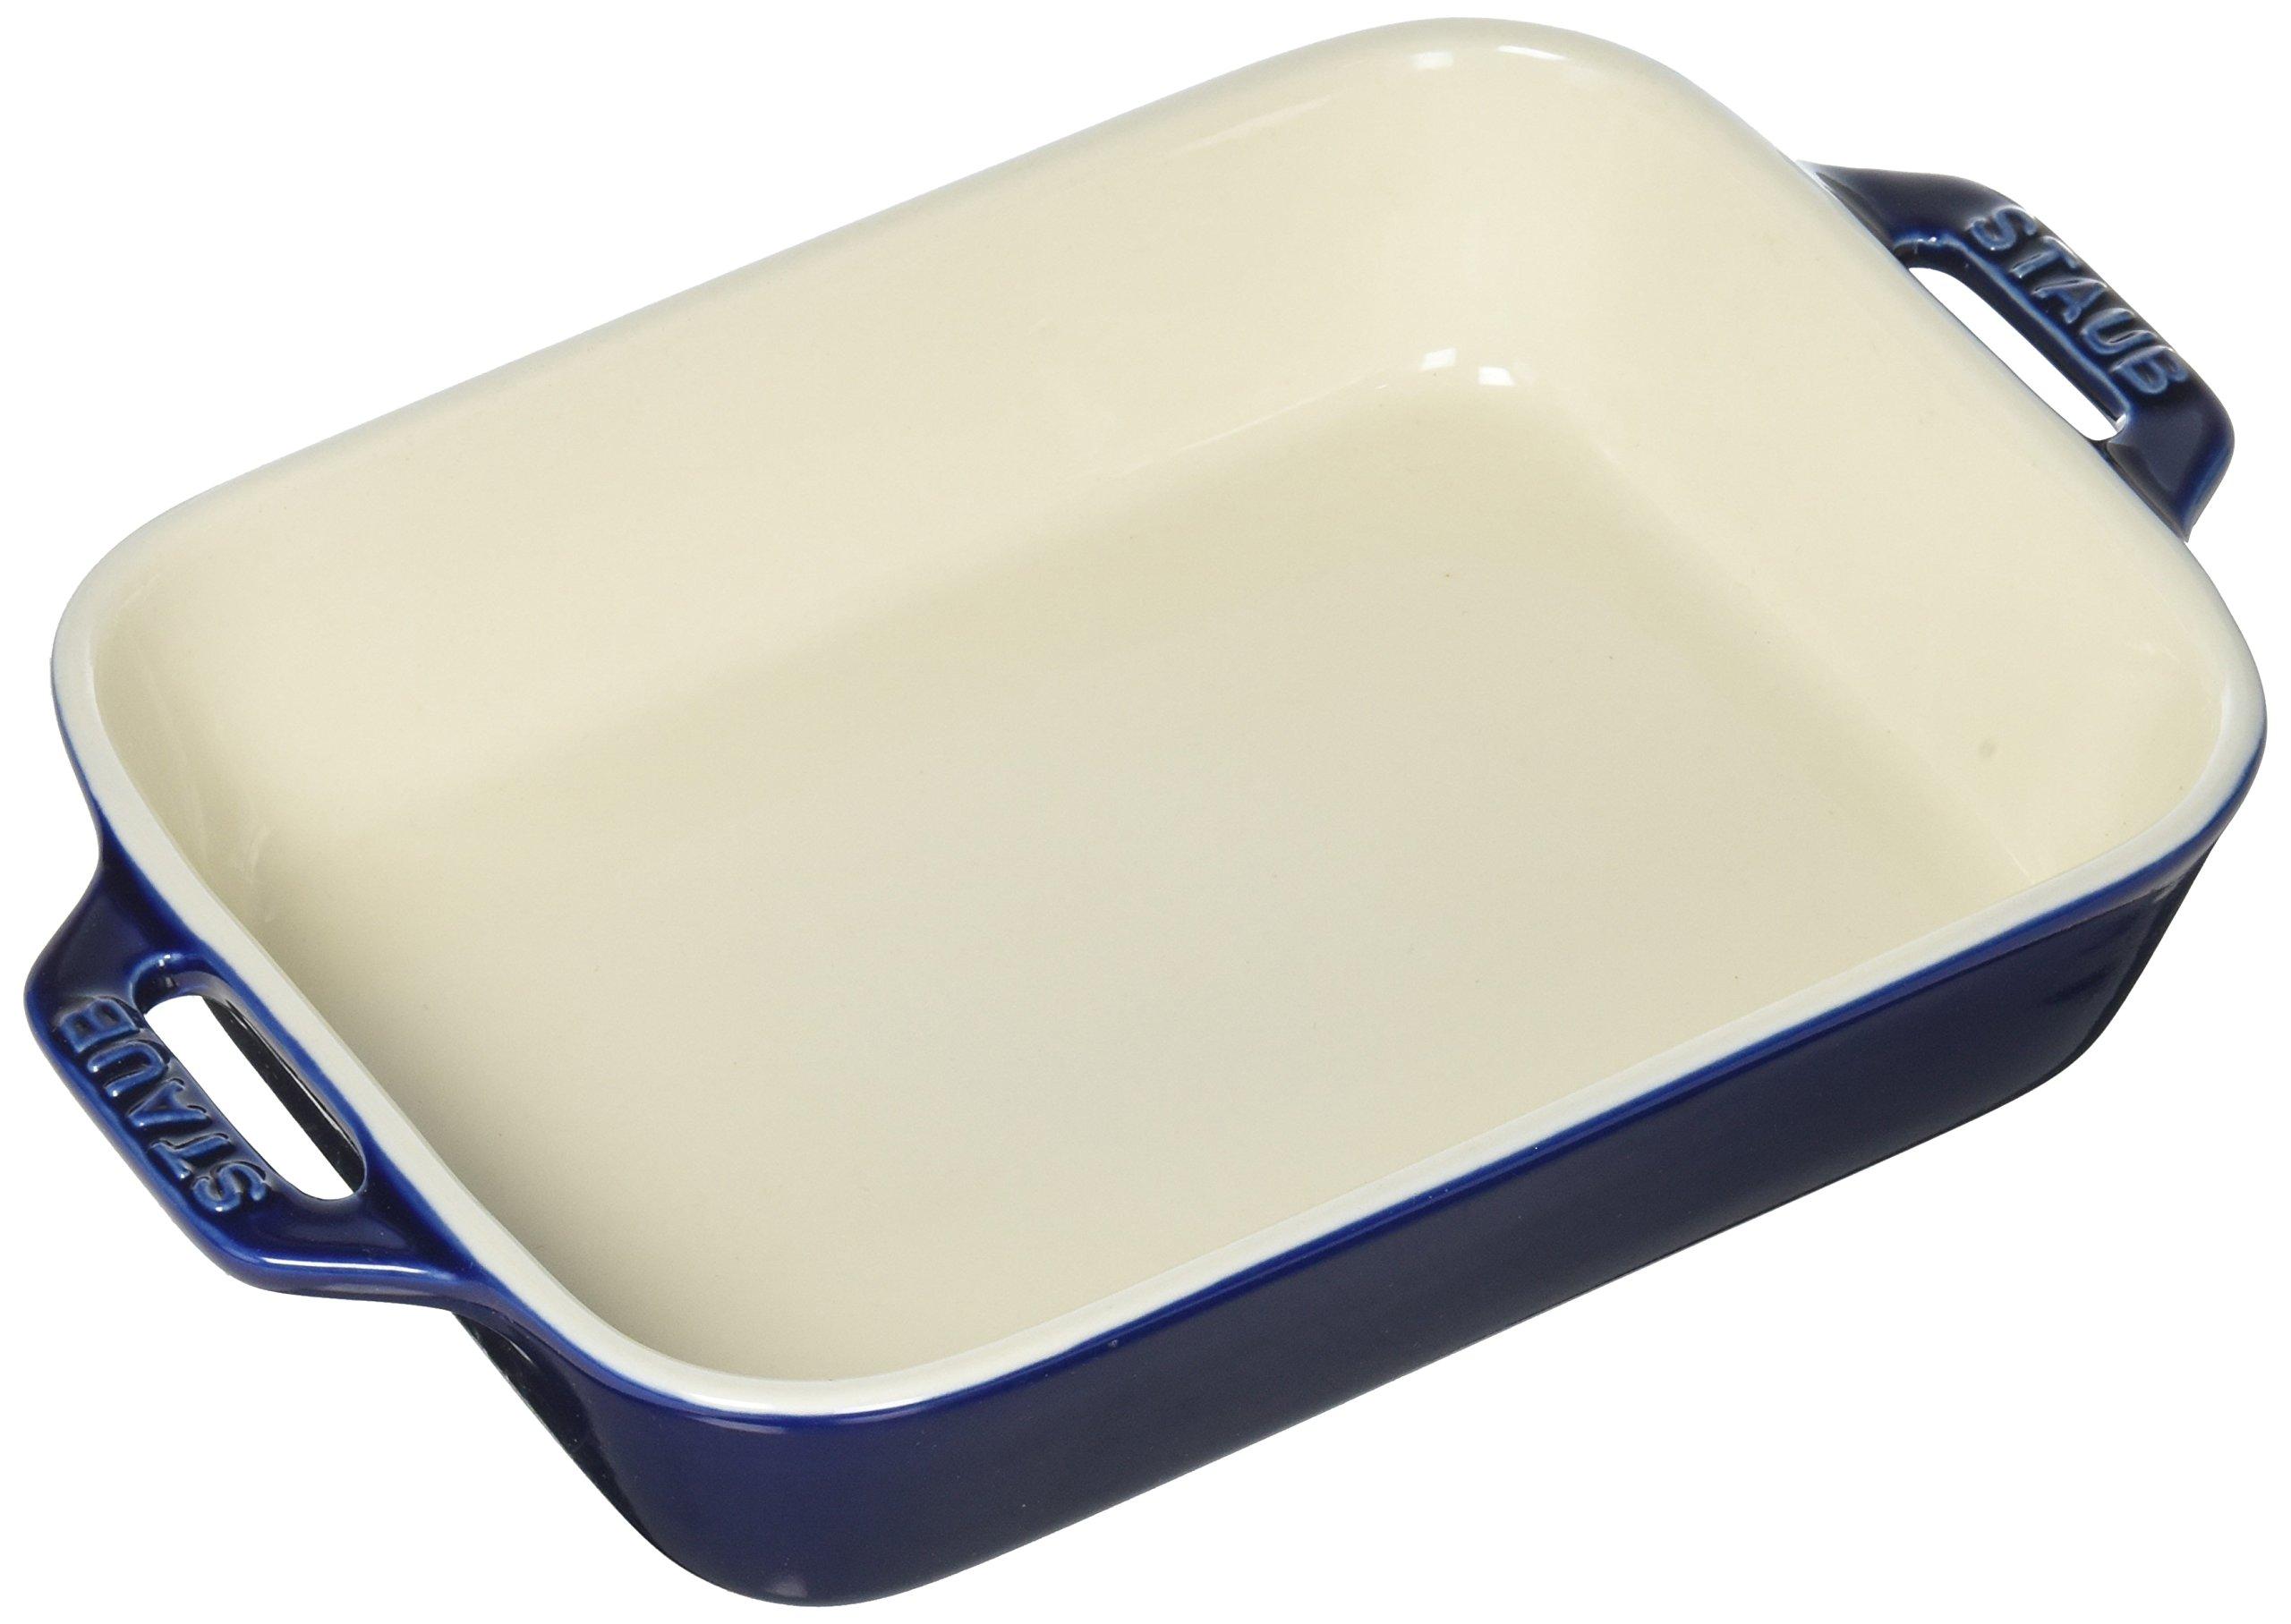 Staub 40508-587 Ceramics Rectangular Baking Dish, 7.5x6-inch, Dark Blue